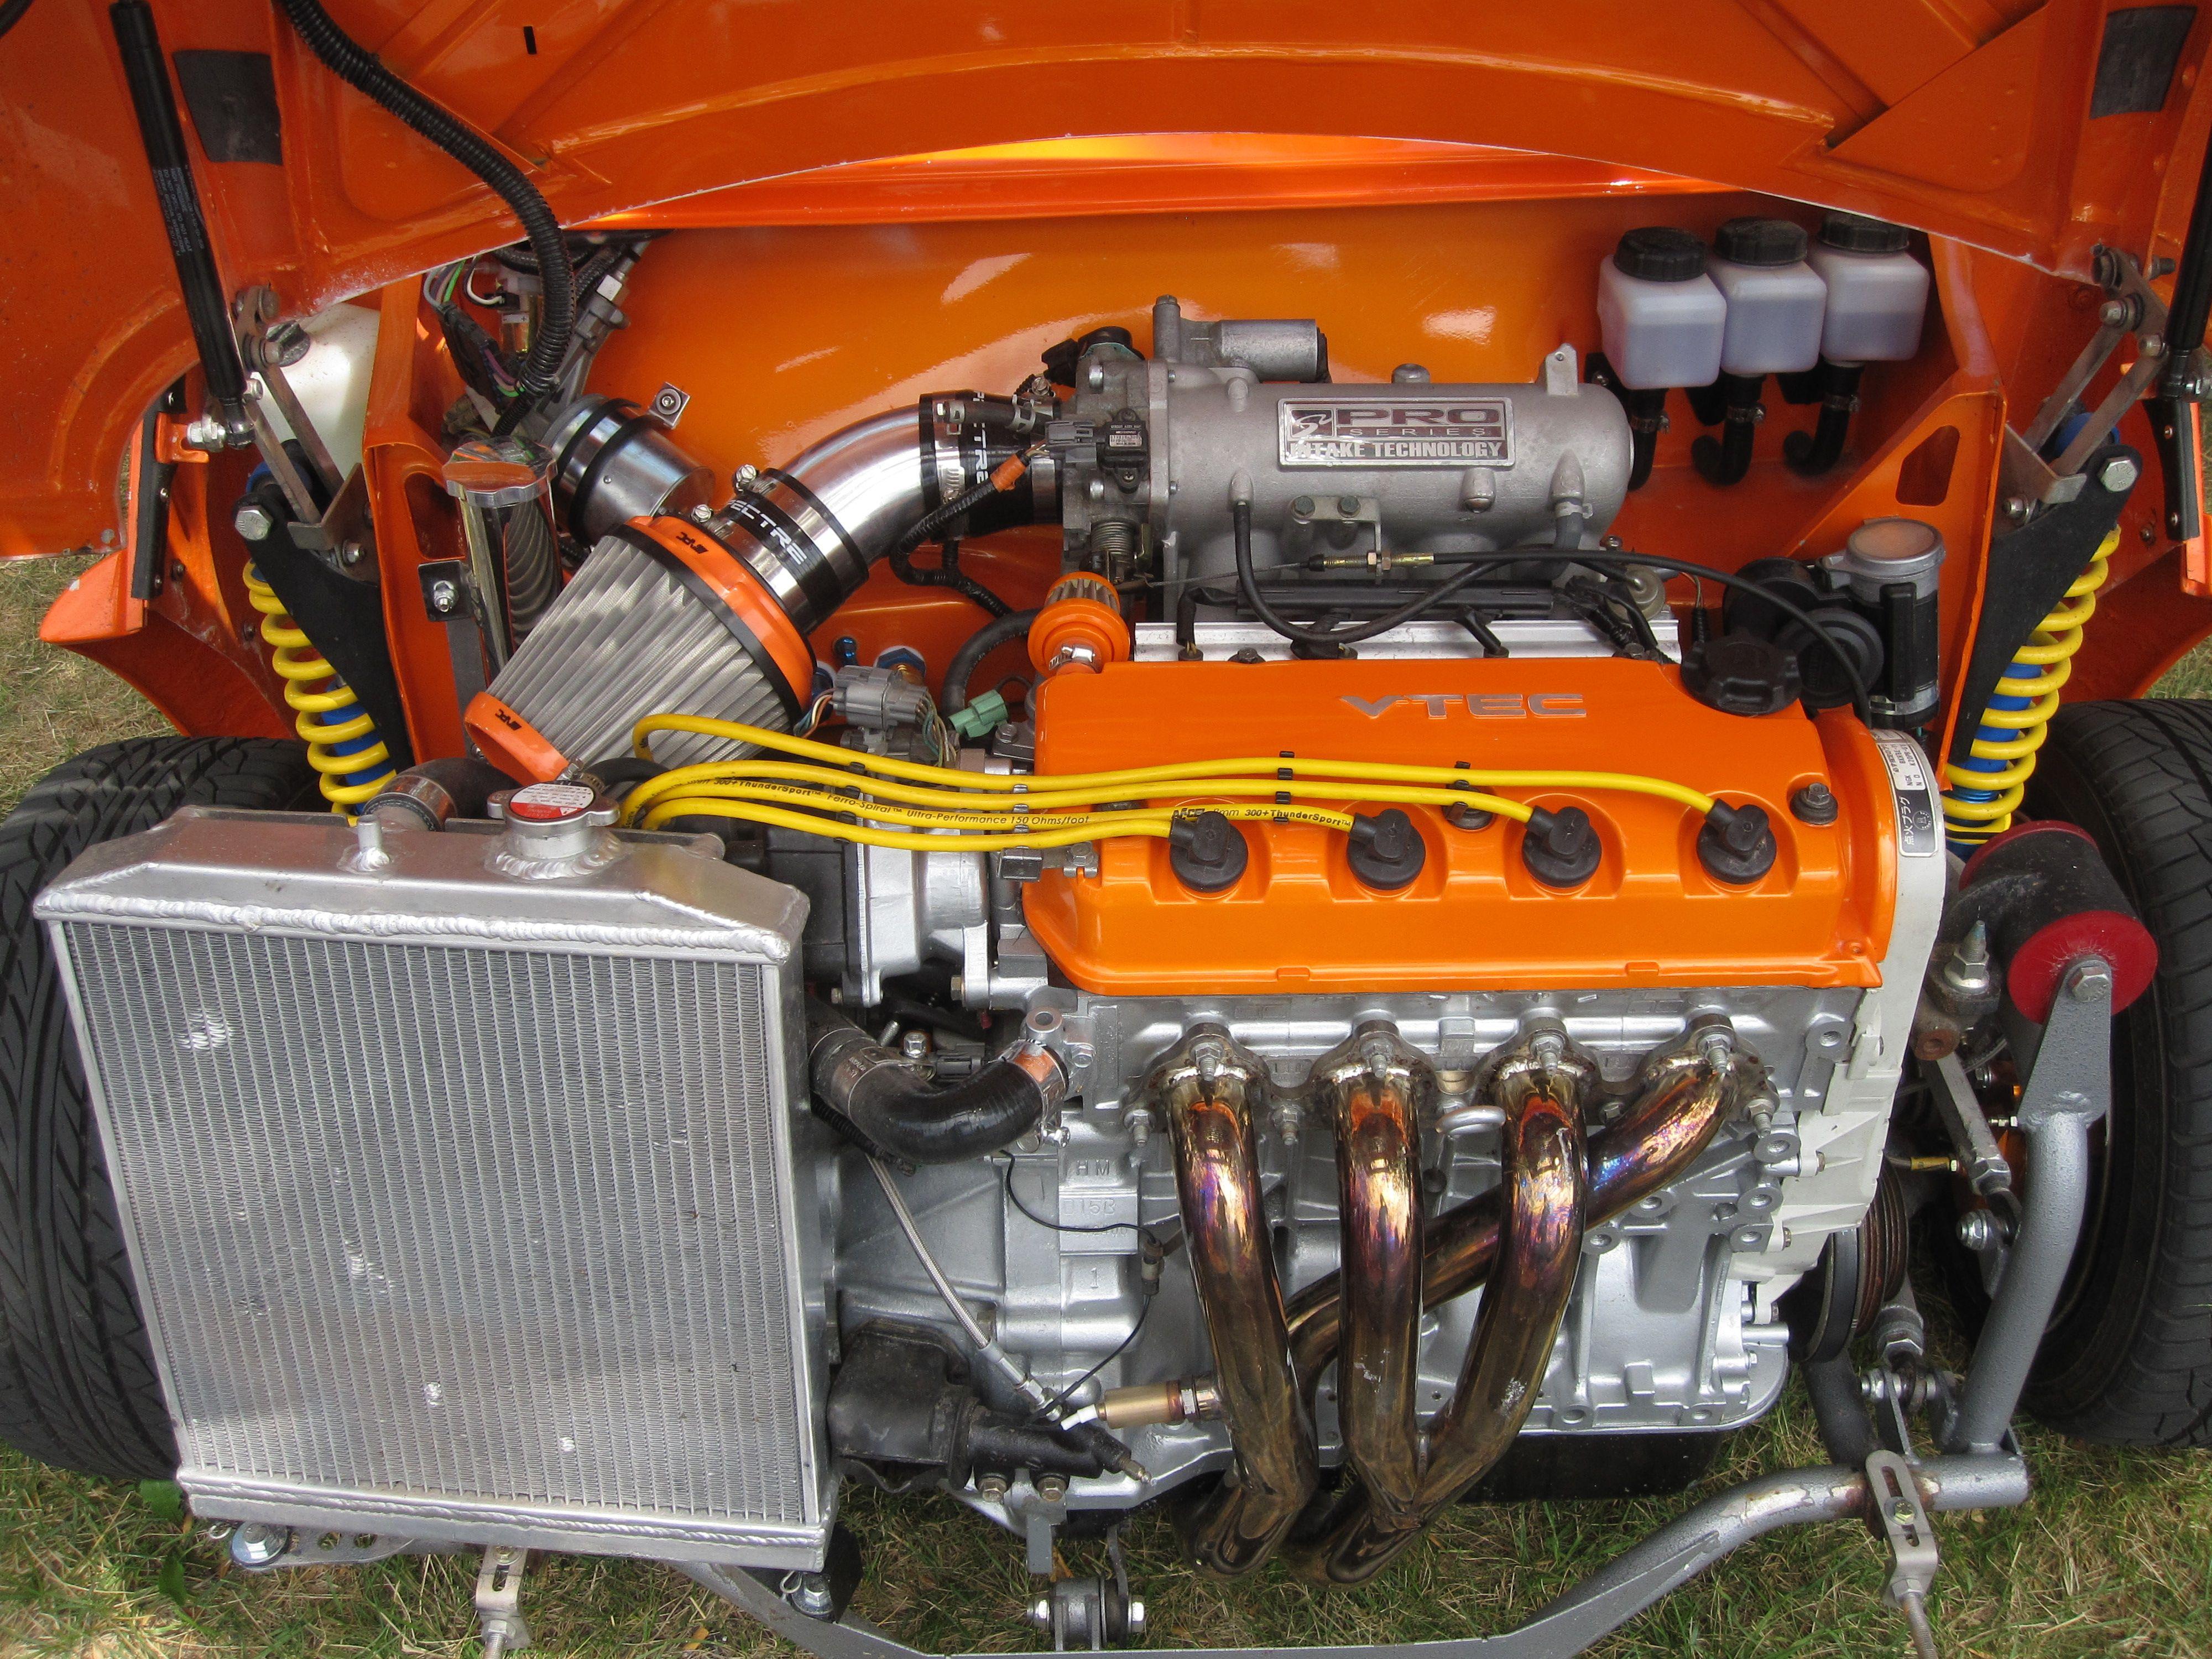 mini austin with honda vtec engine 1 5vtec   V-TEC Mini   Honda vtec